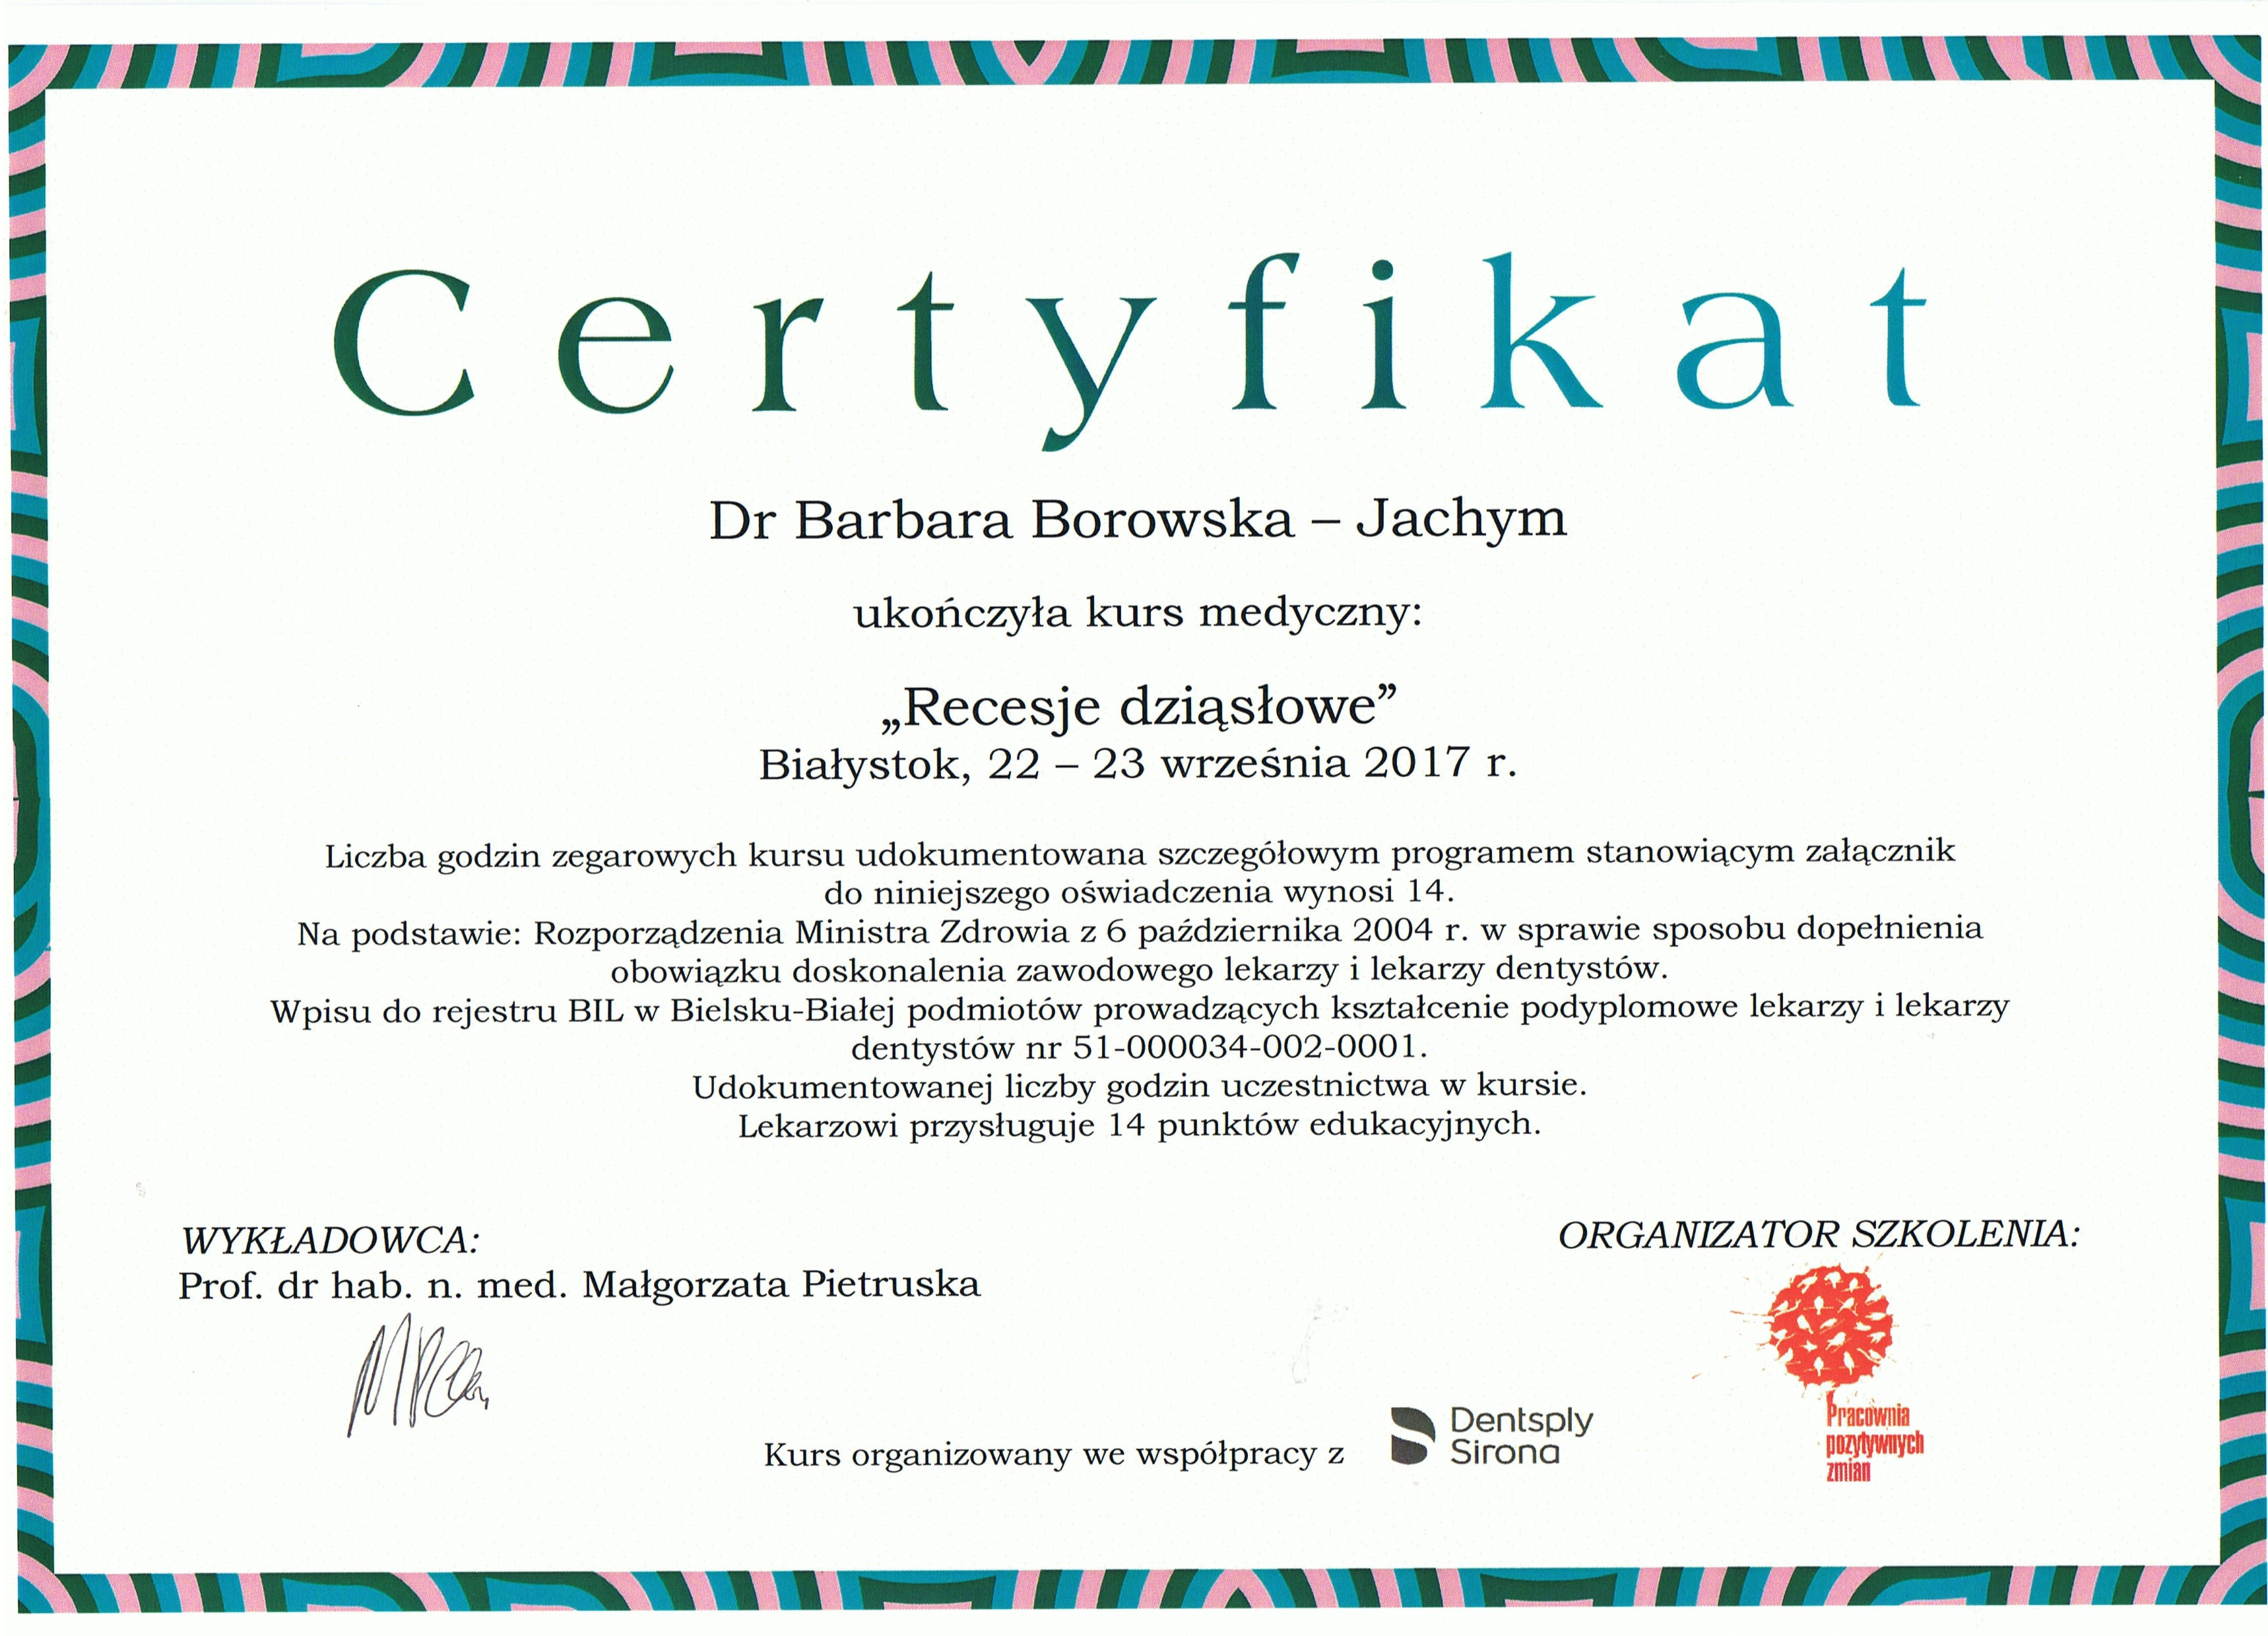 CCF20171009 00000 - Dr Barbara Borowska-Jachym